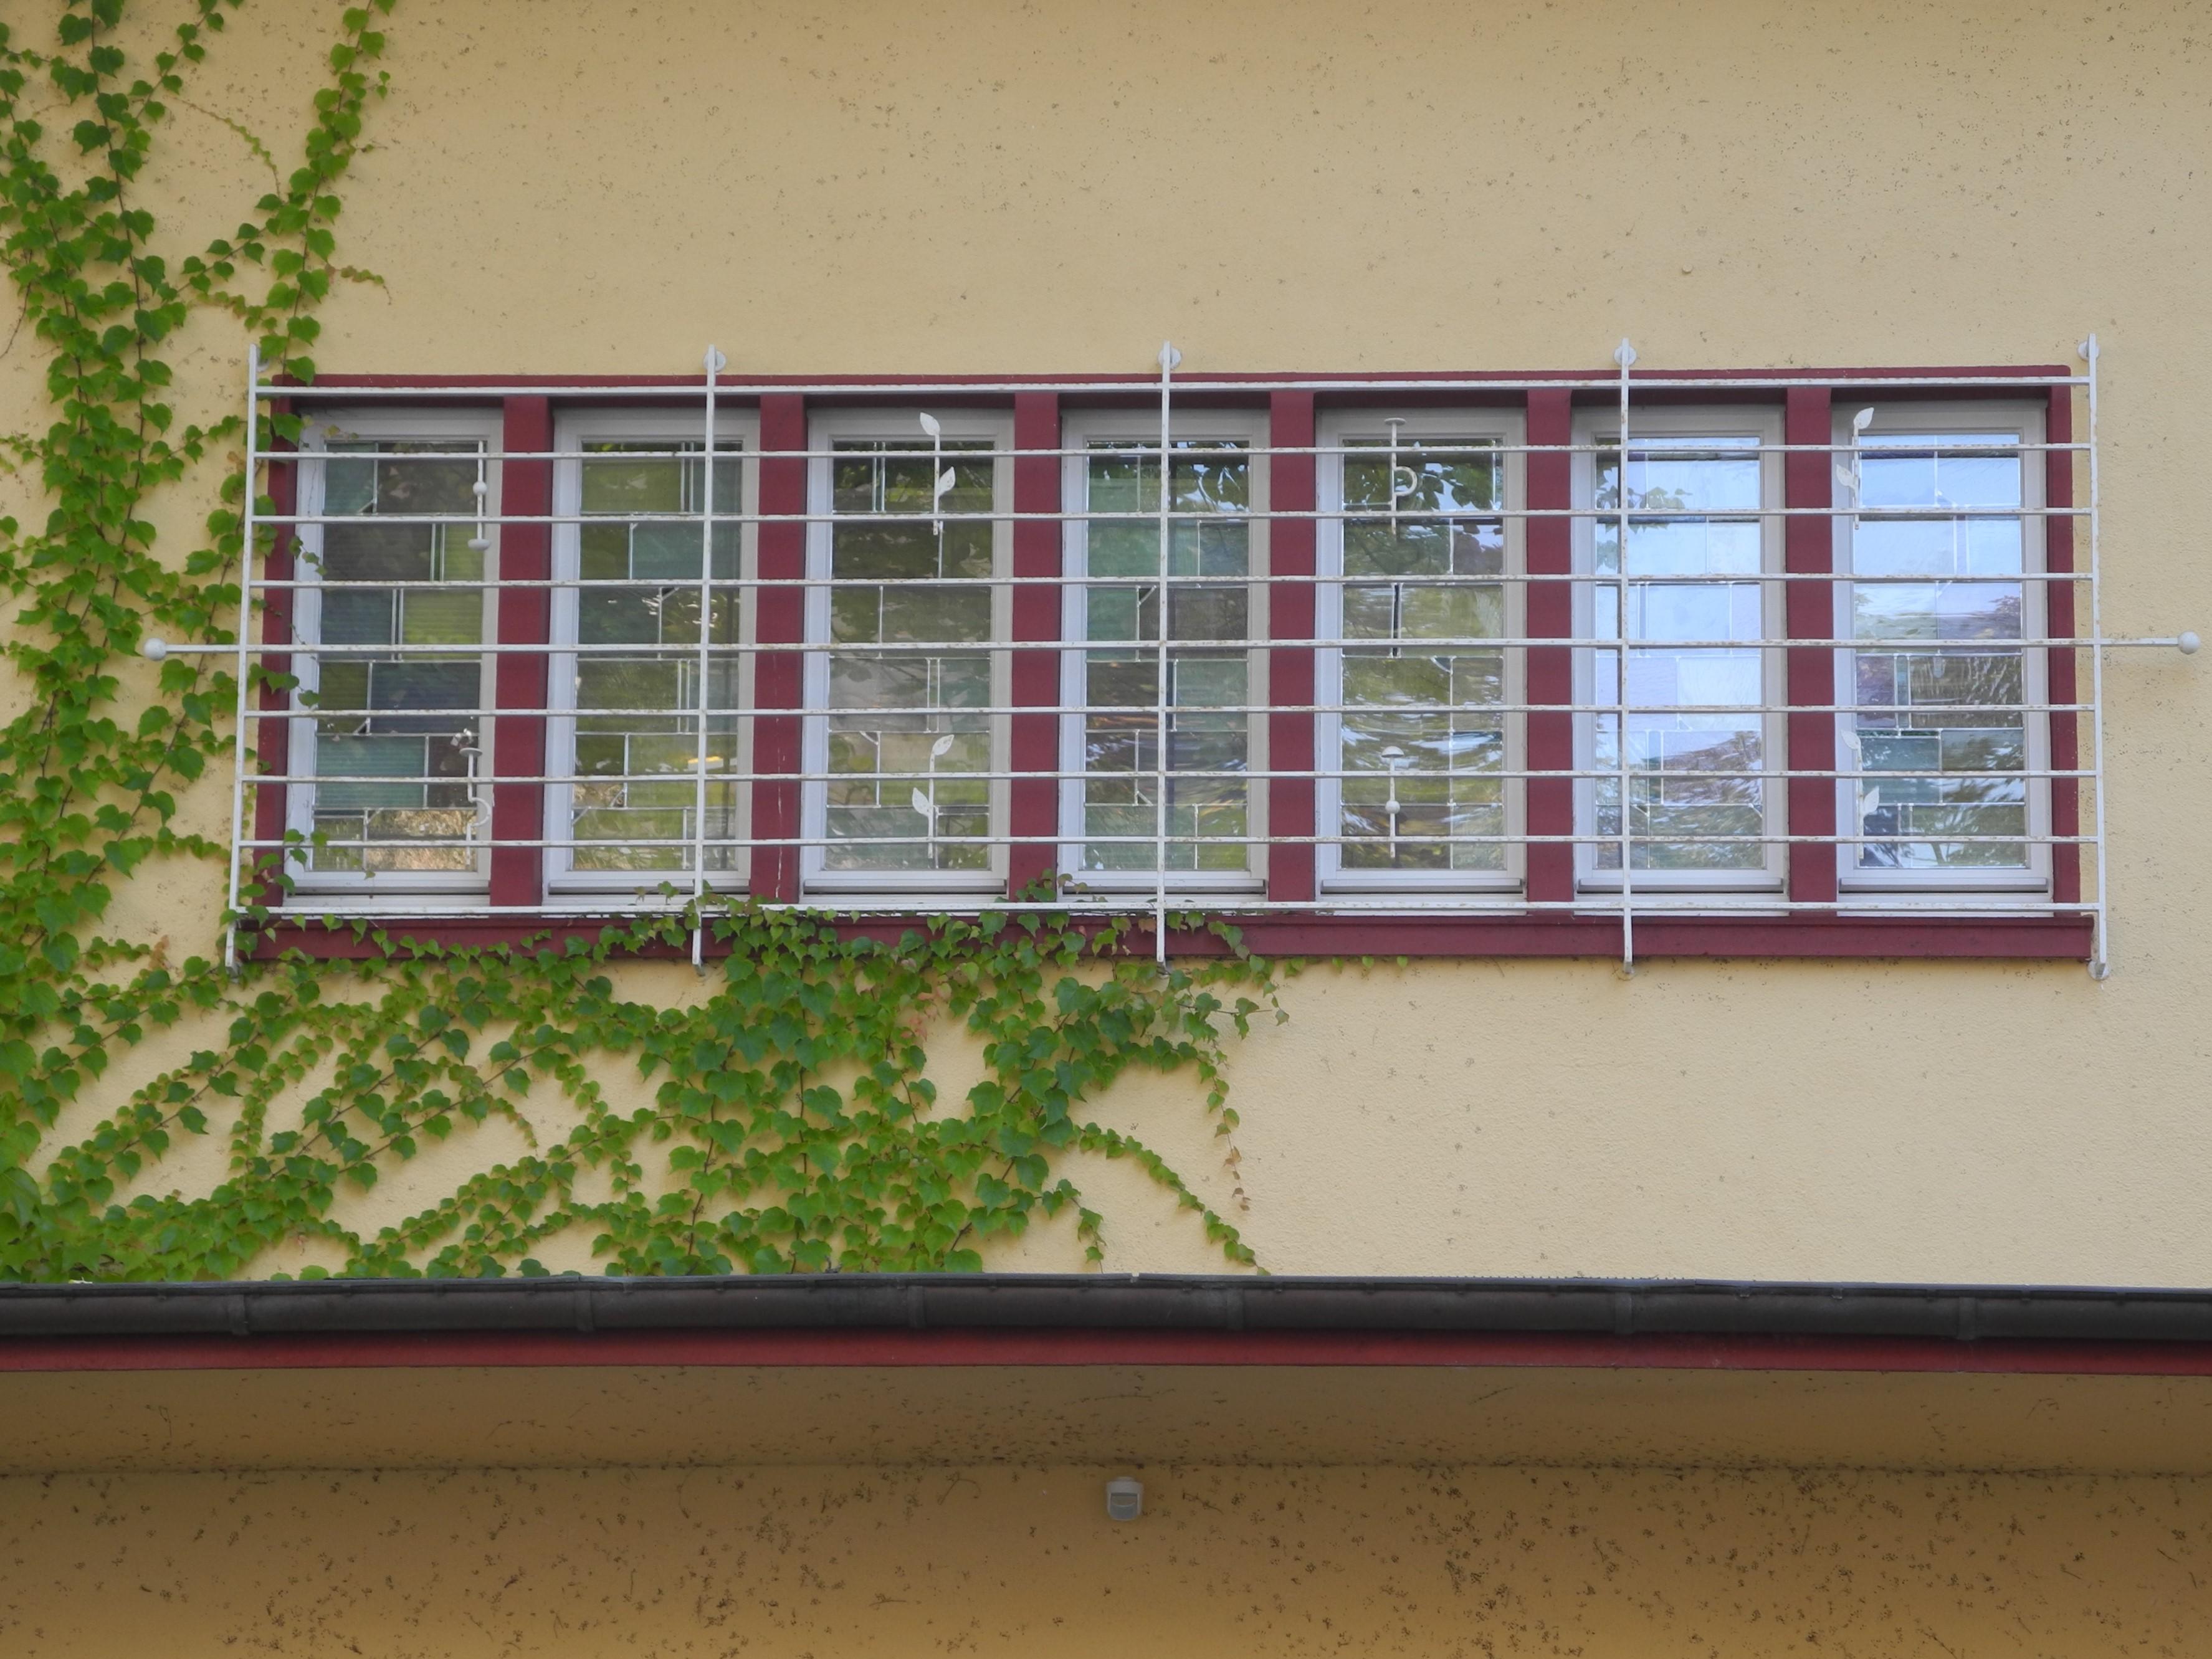 Fenster Band file wuppertal freyastr 40 fensterband jpg wikimedia commons